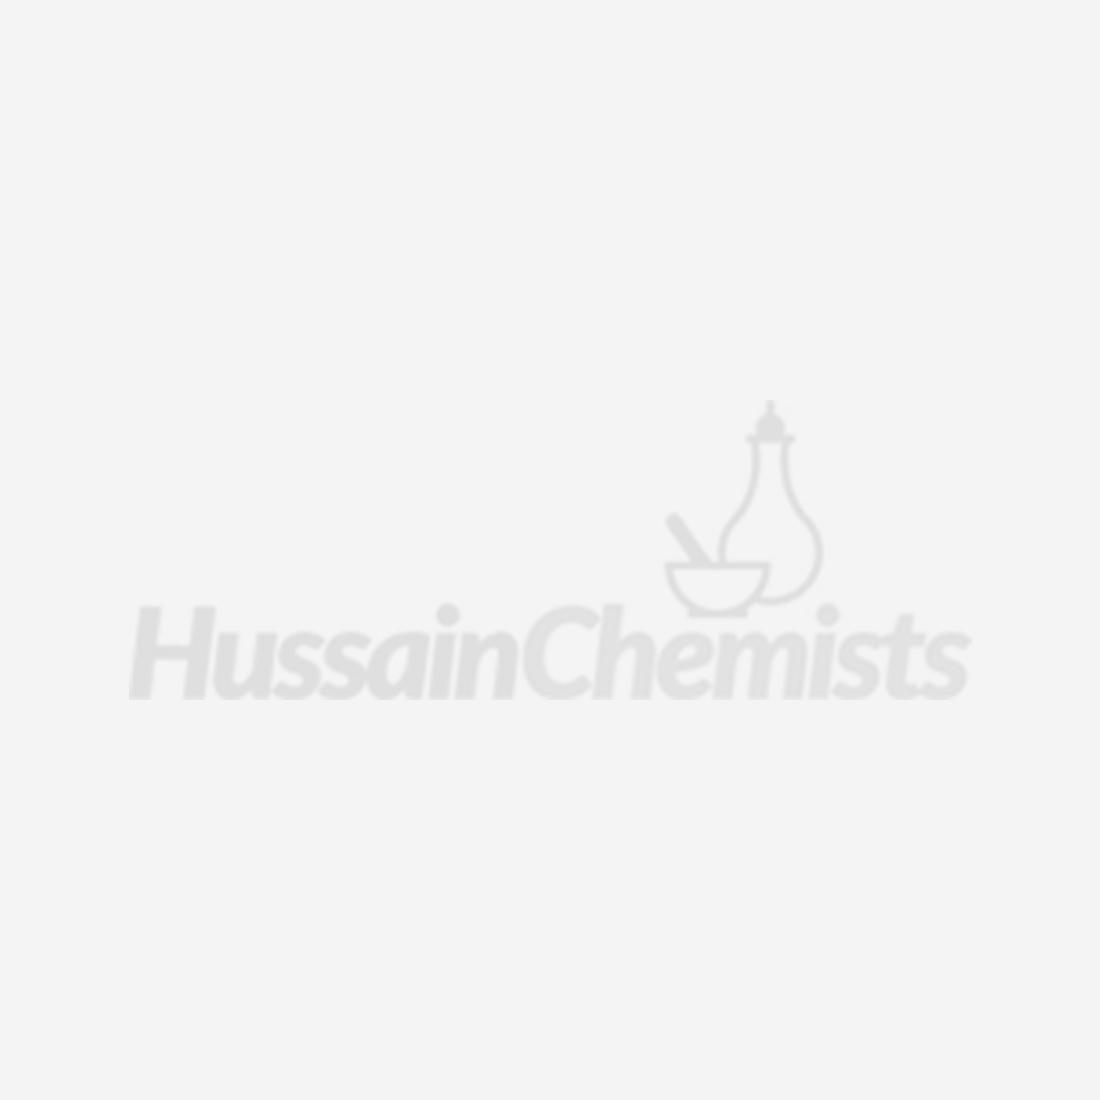 Canesten Thrush Cream - 2% (Clotrimazole) 20g